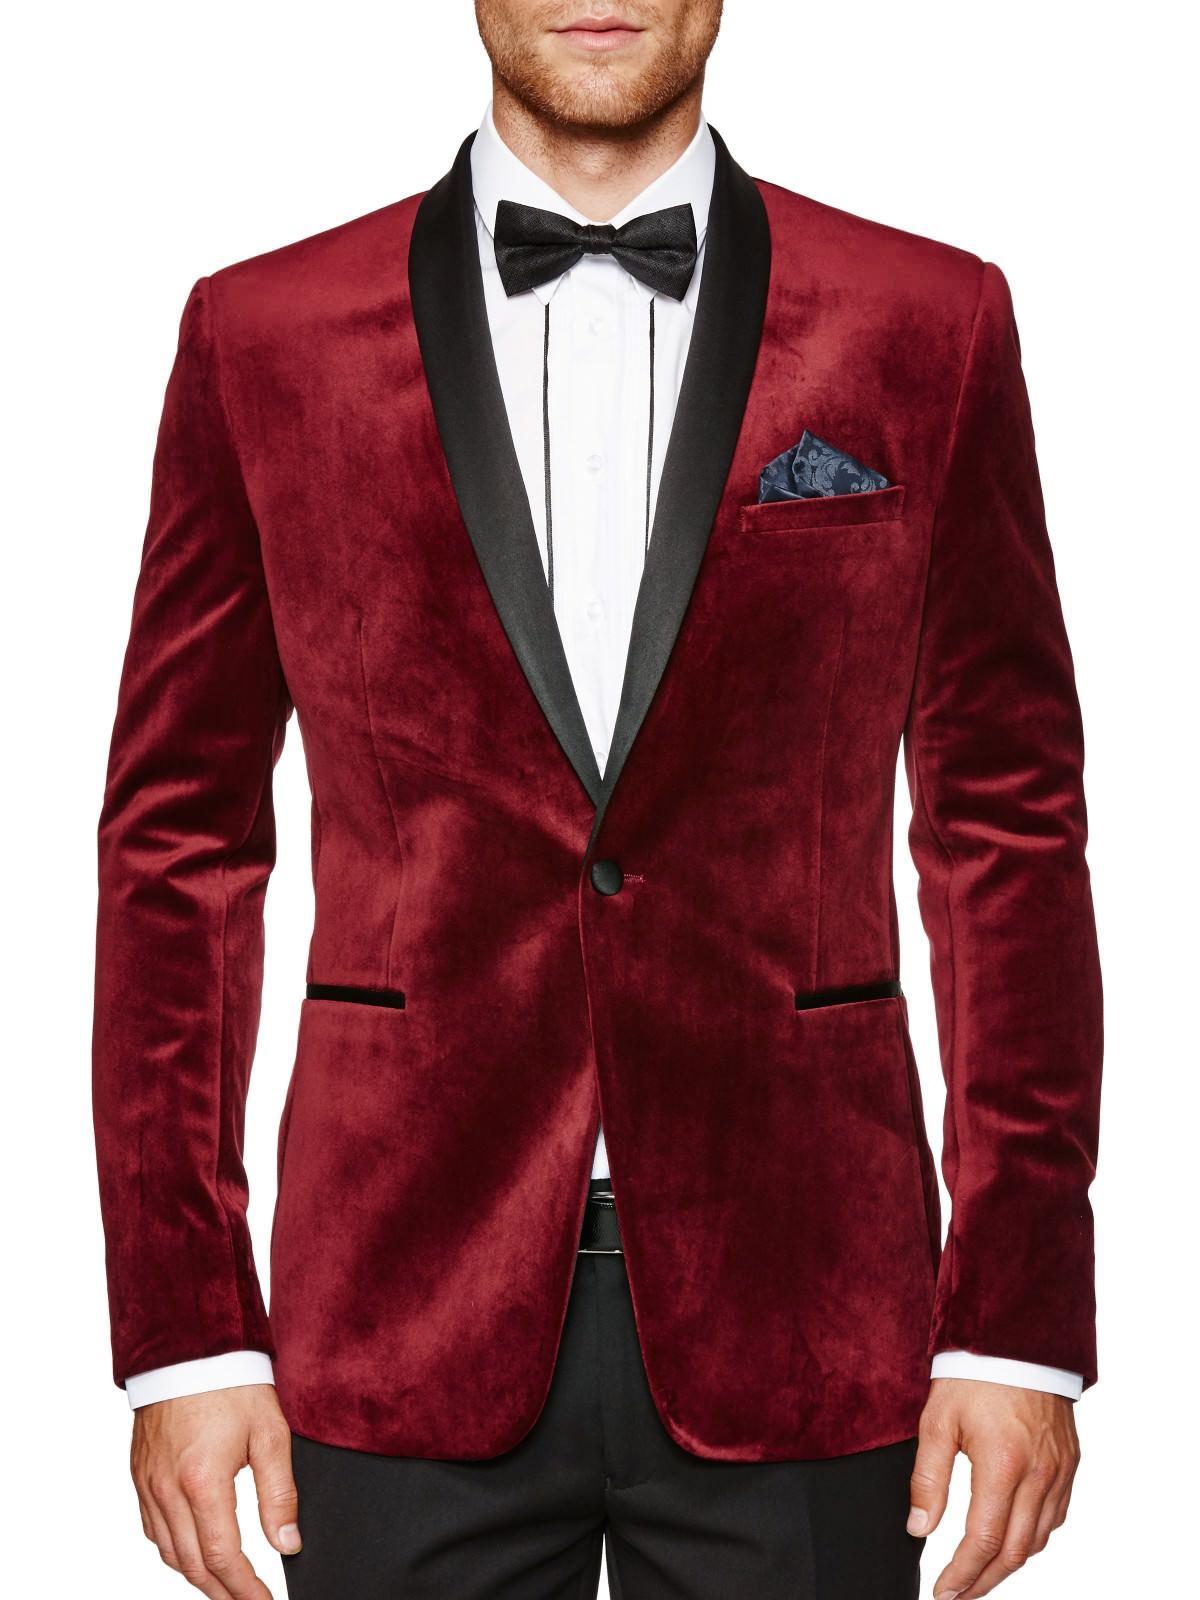 Burgundy Velvet Slim Fit 2016 Groom Tuxedos Wedding Suits with Skinny Black Shawl Lapel Custom Made Groomsmen Best Man Prom Suits